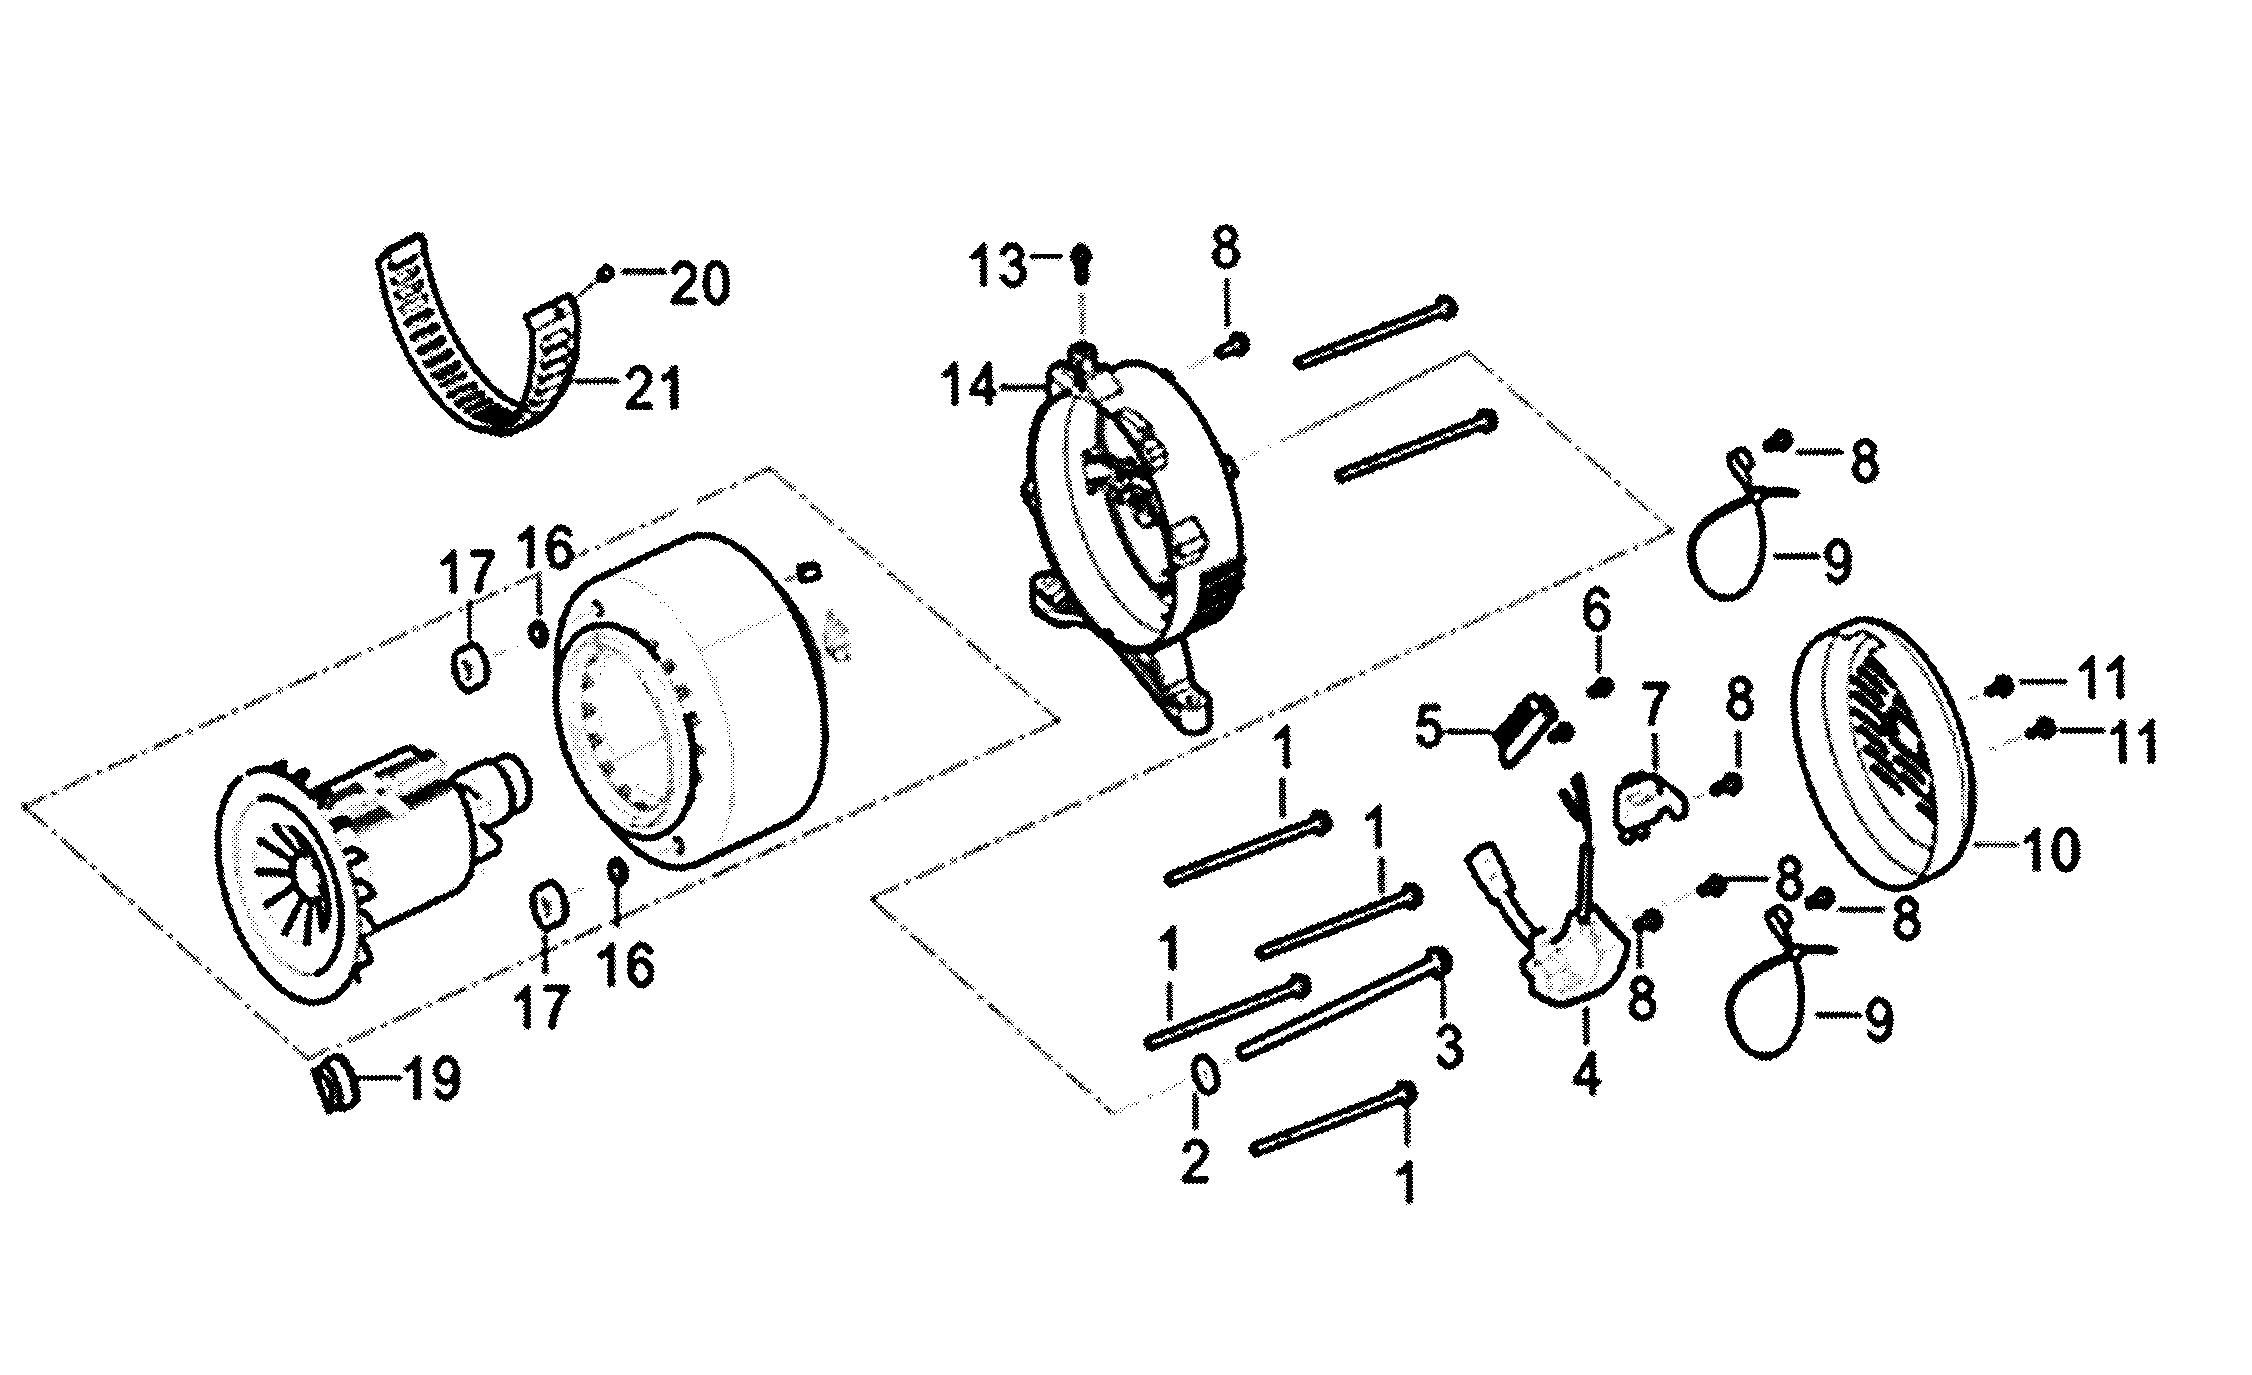 Generac 18kw Generator Voltage Regulator Wiring Diagram